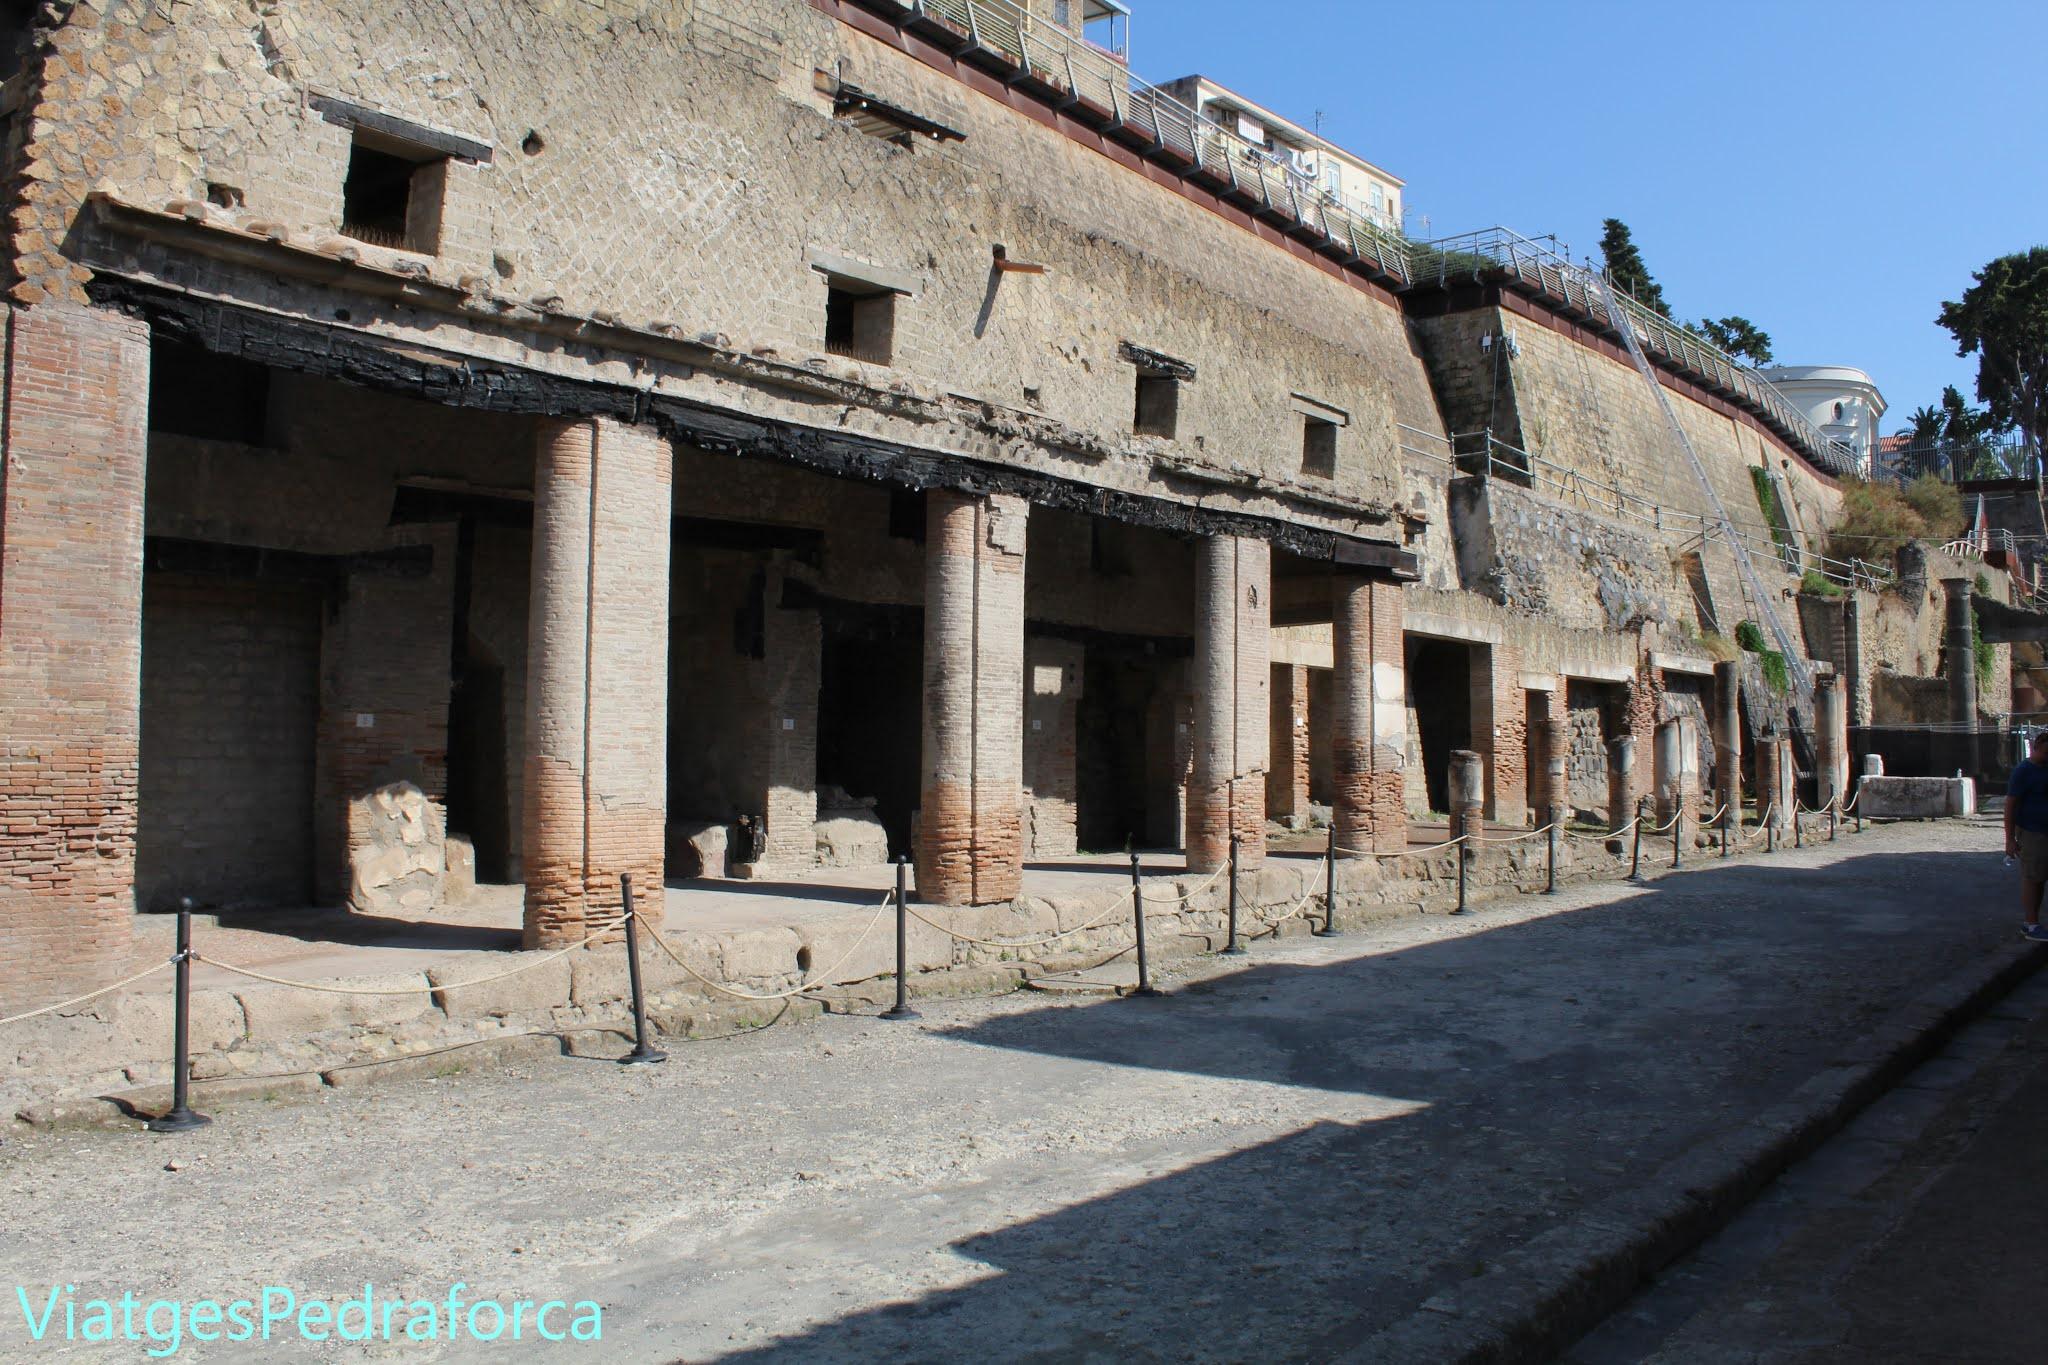 Campània, Itàlia, arqueologia, Patrimoni de la Humanitat, Unesco Heritage Site